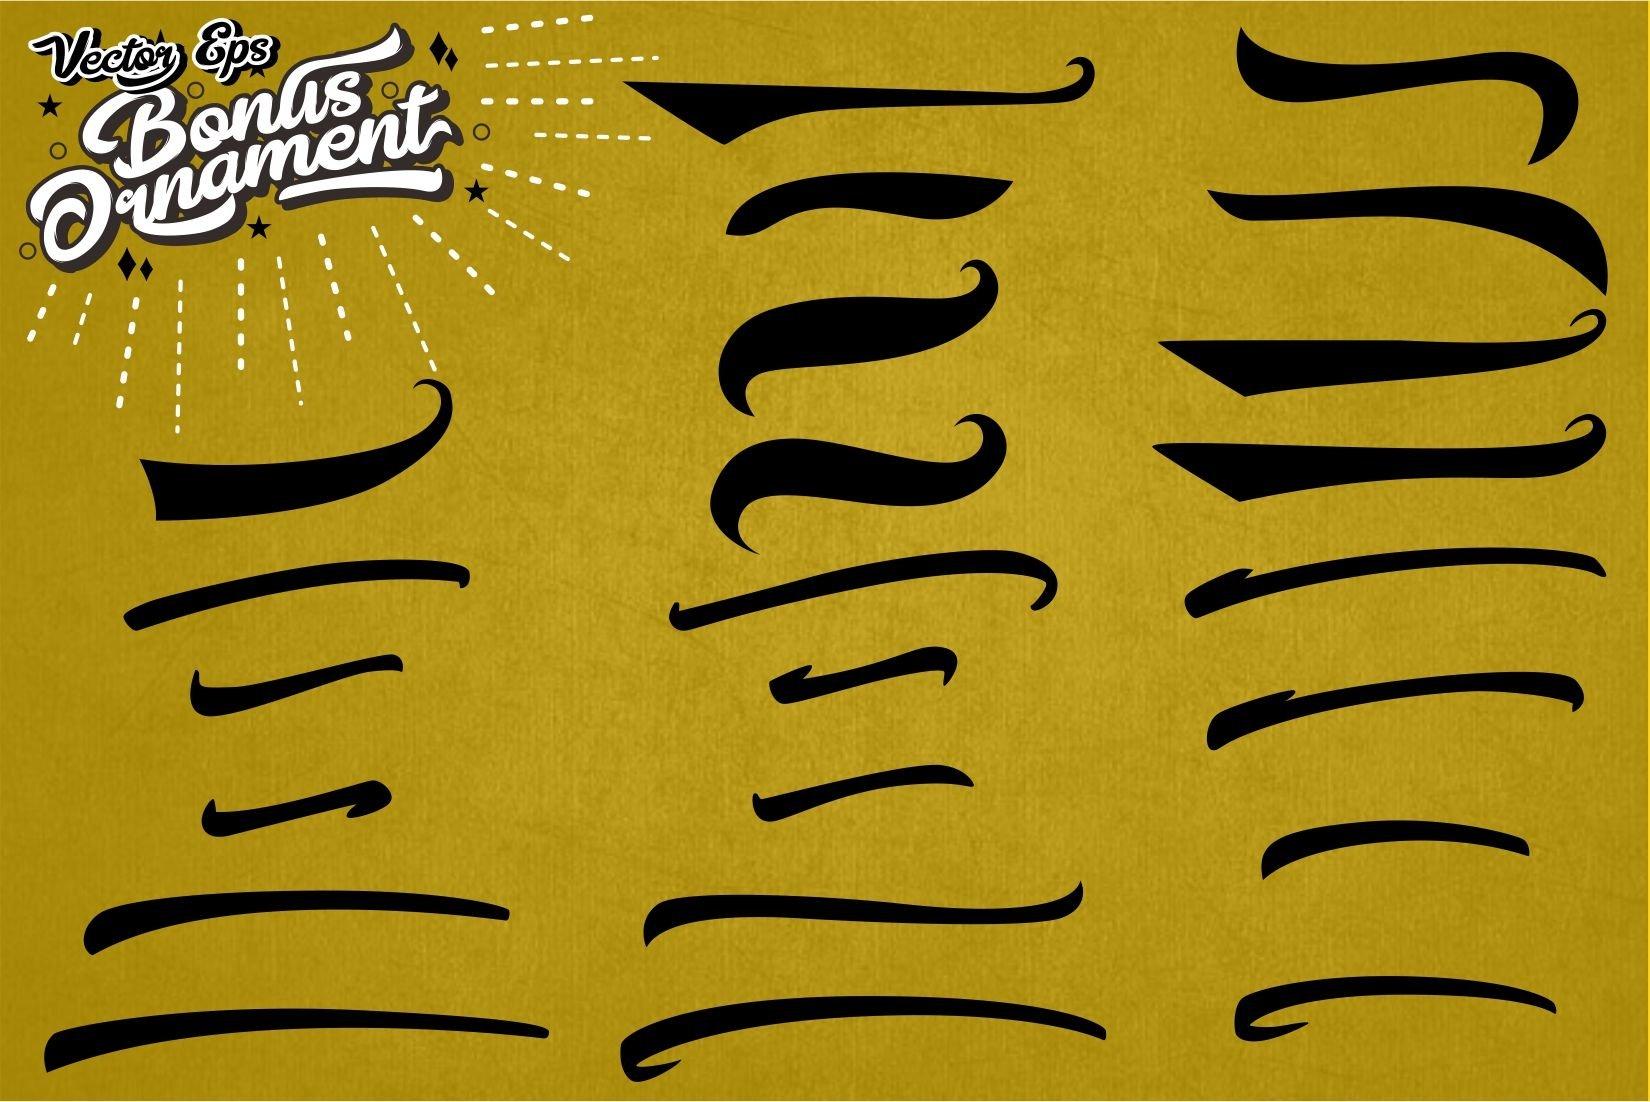 Epines Bold Brush Modern Script Bonus Swash example image 9